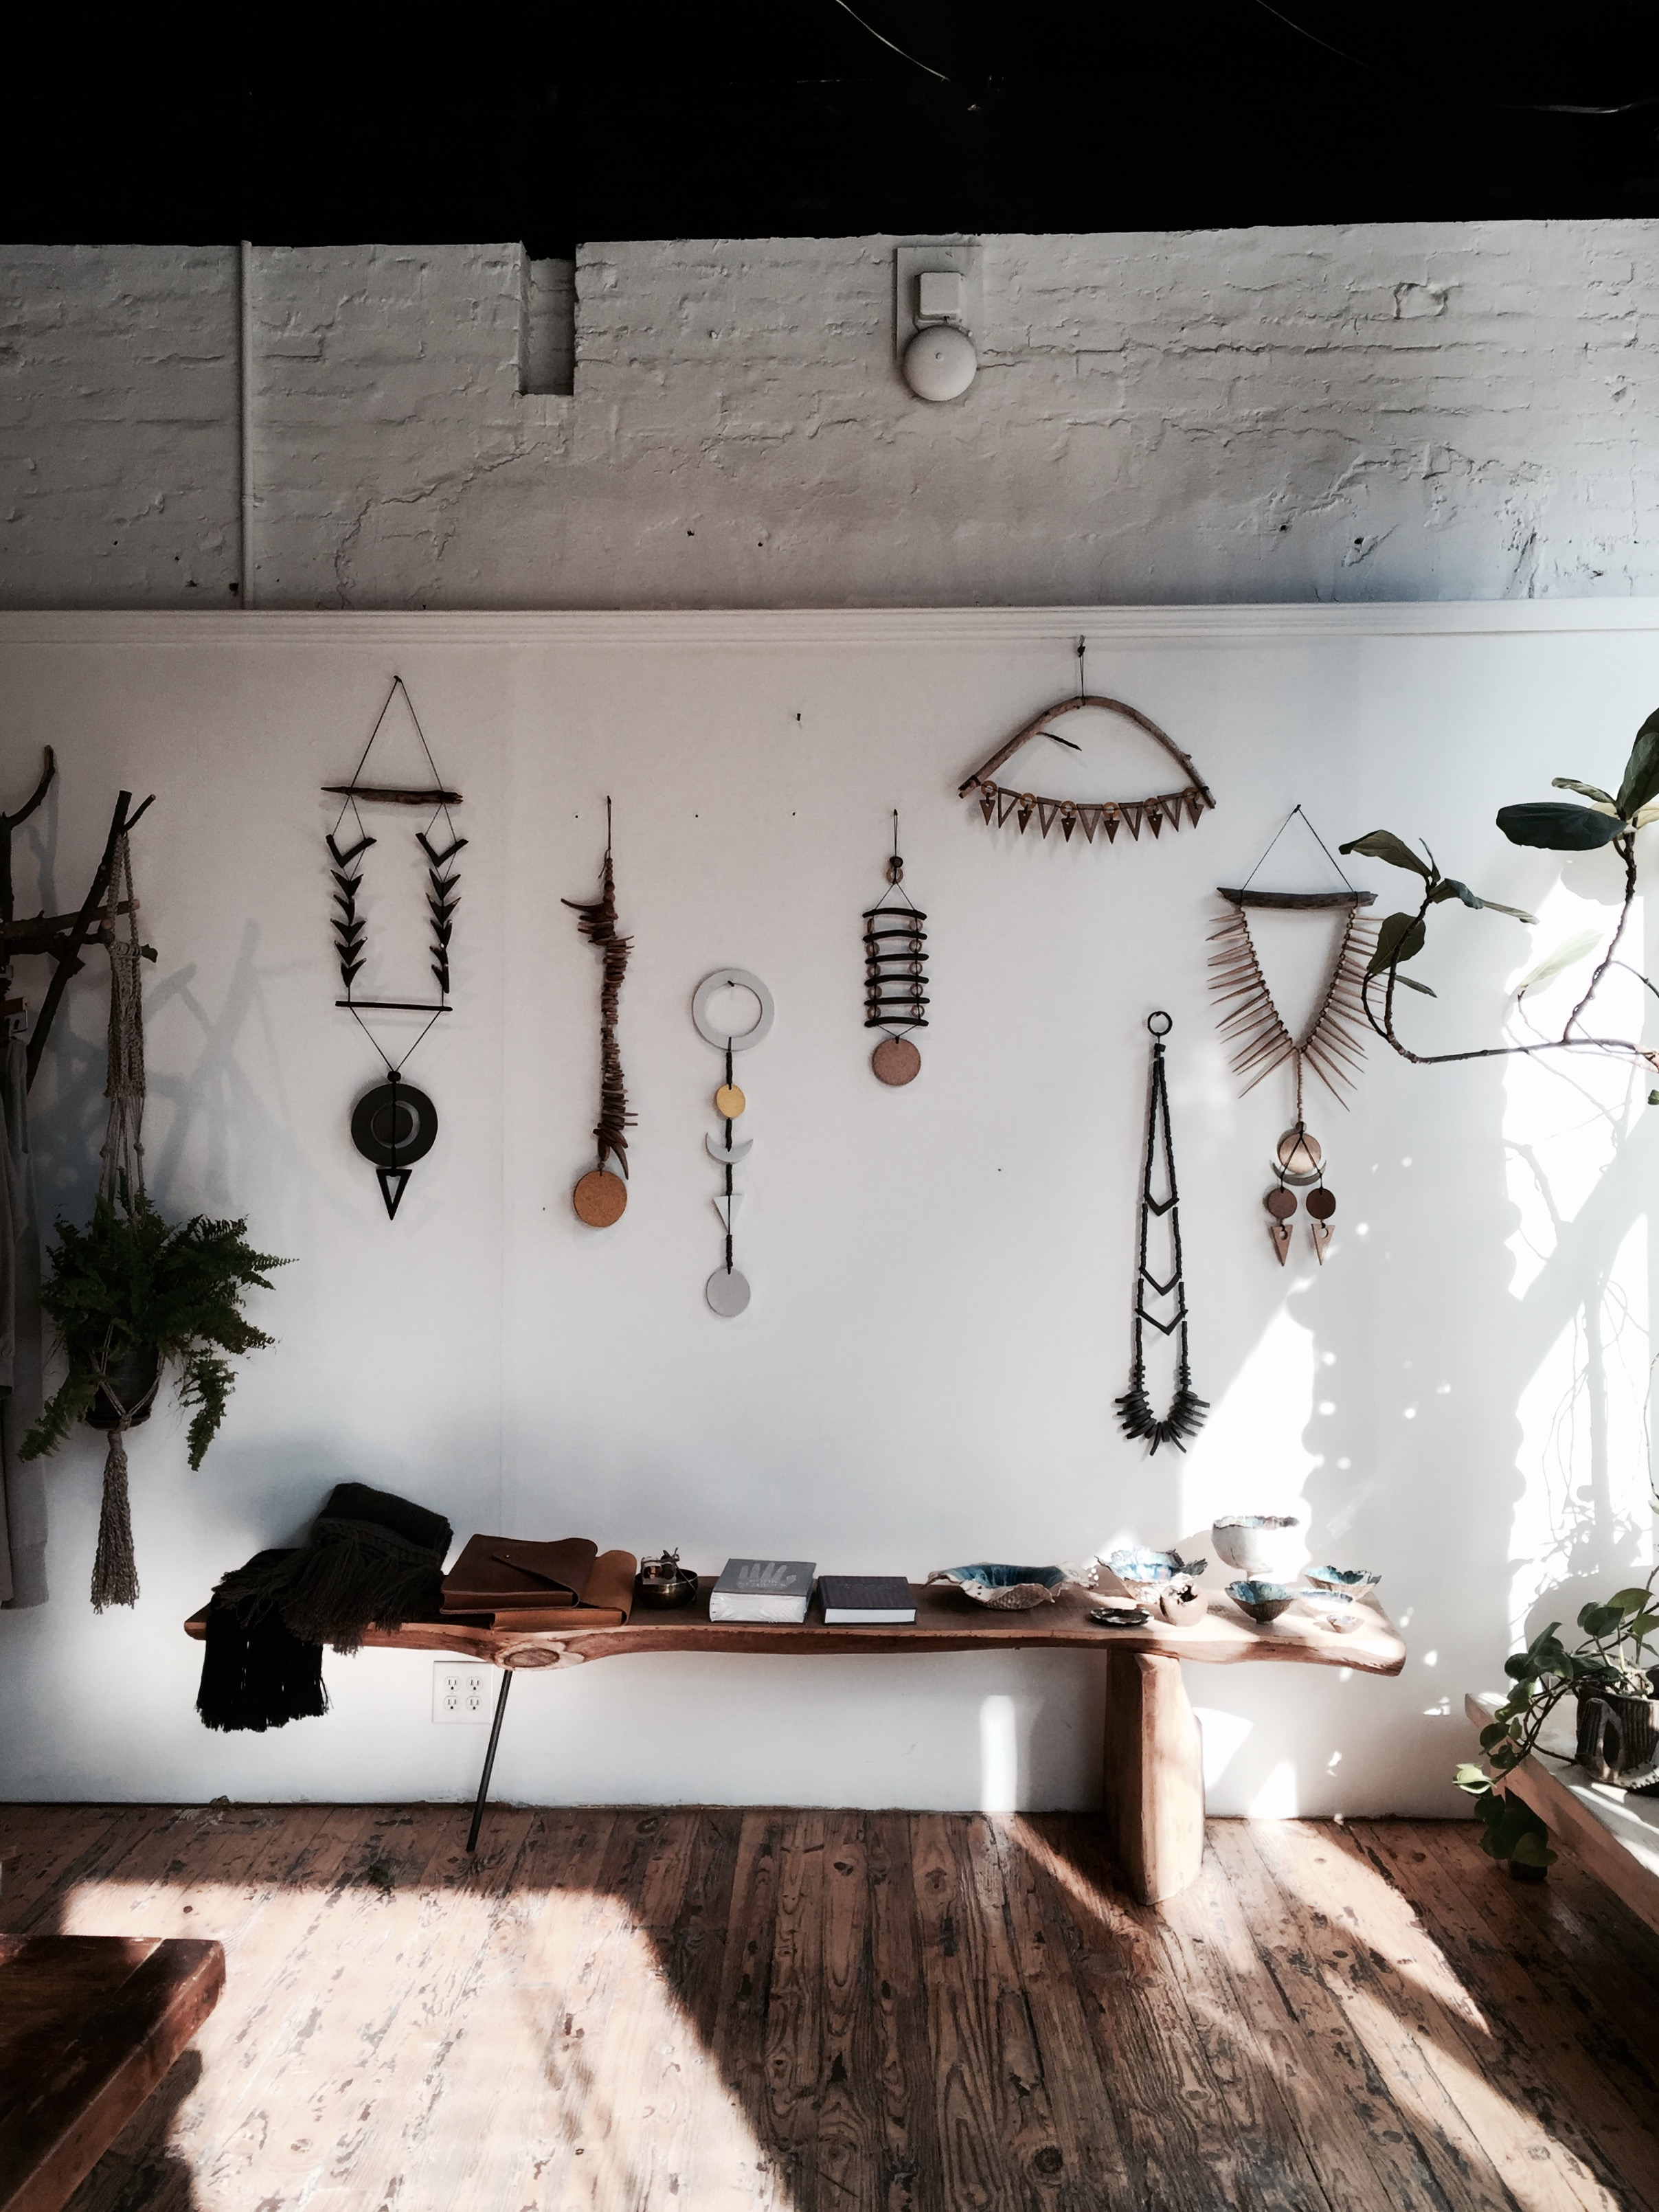 ROSE & IVY Journal Pretty Shops Oroboro Brooklyn